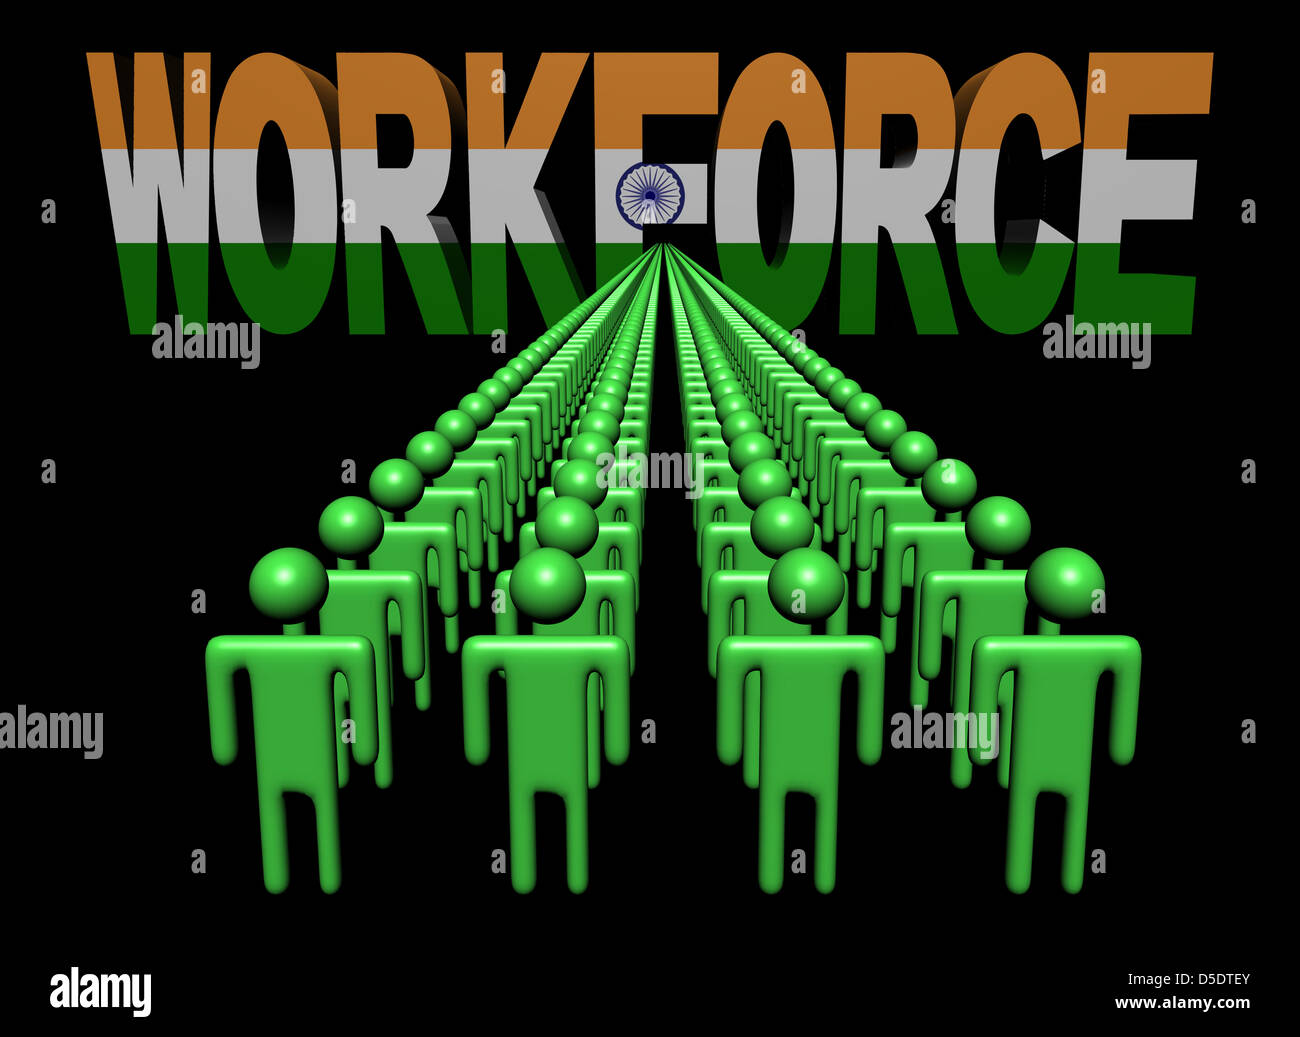 Indian Workforce Flag Text Illustration Imágenes De Stock & Indian ...